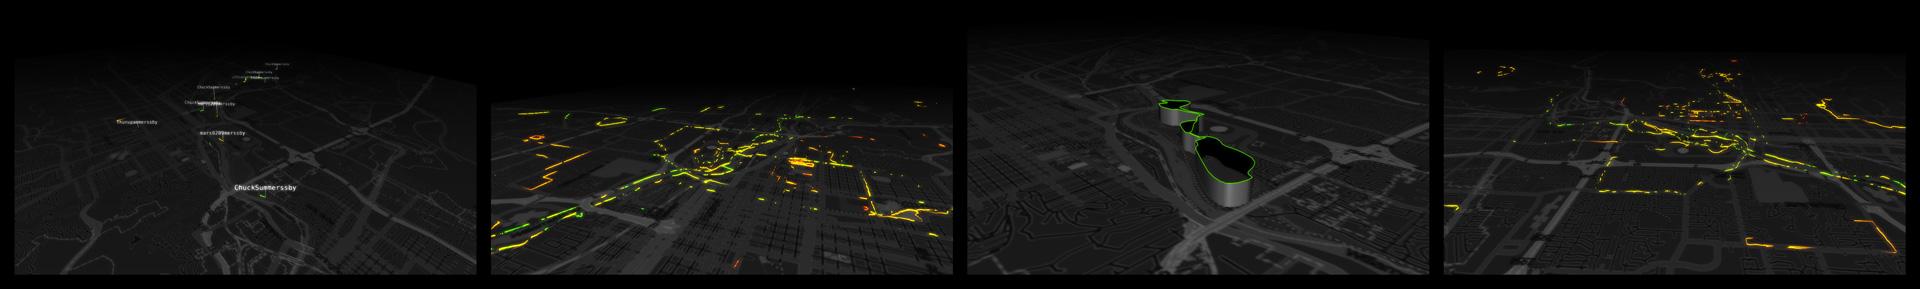 State04_maps_V1.jpg